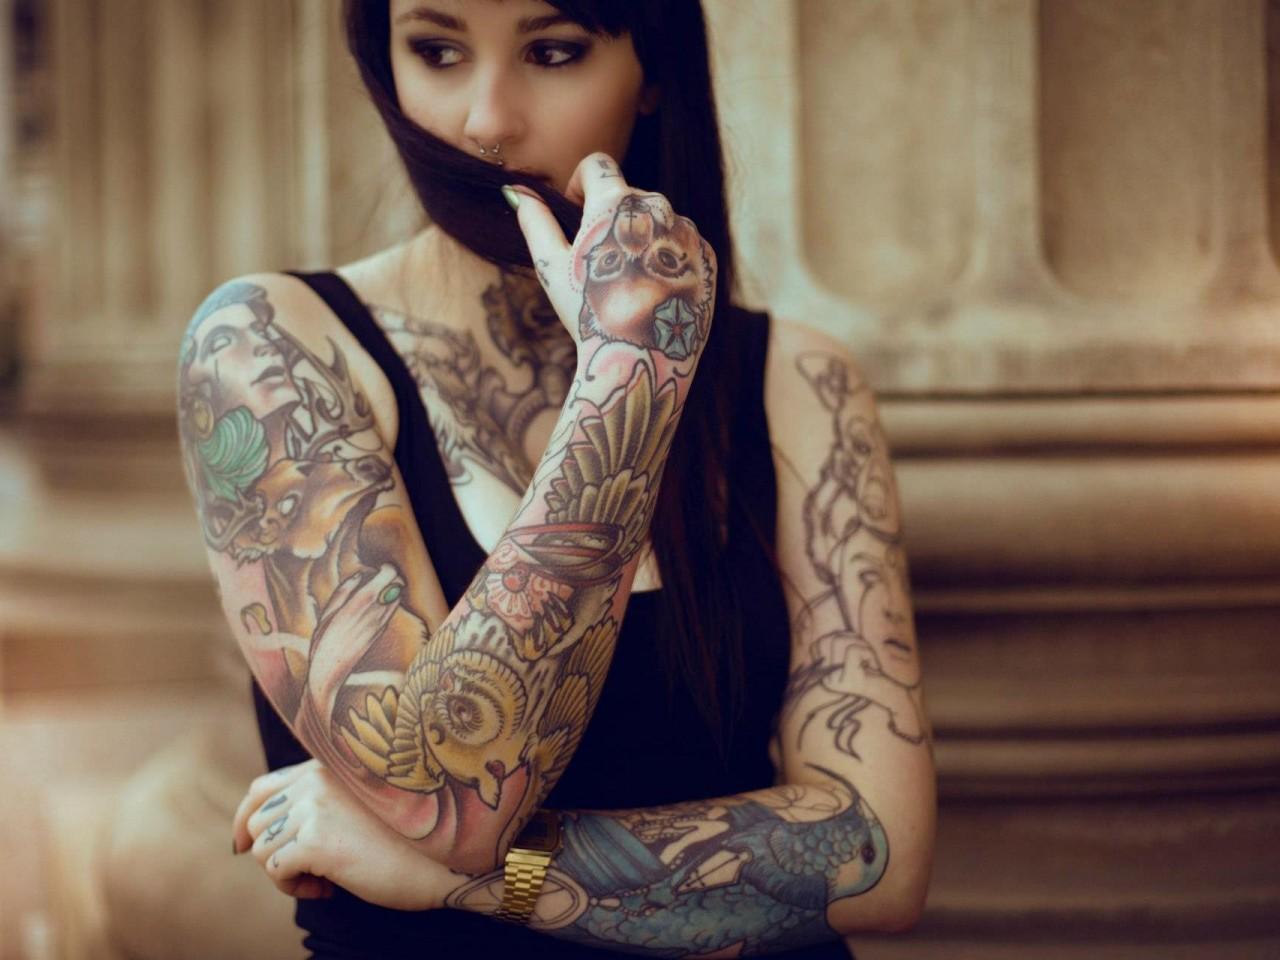 Free Download Tattoos Girls White Sexy Blonde Hot Wallpaper Images